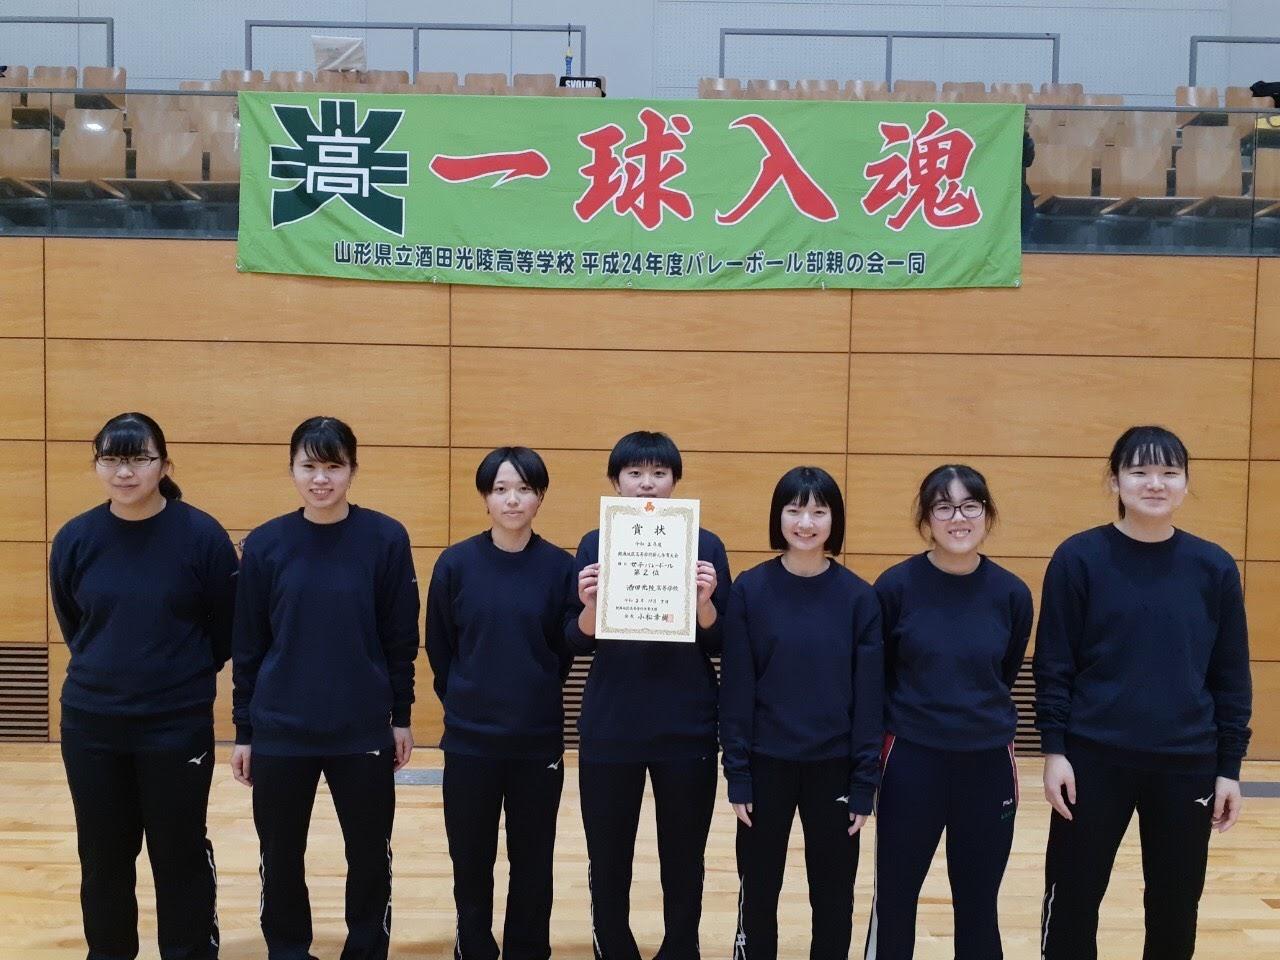 山形県立酒田光陵高等学校 女子バレーボール部